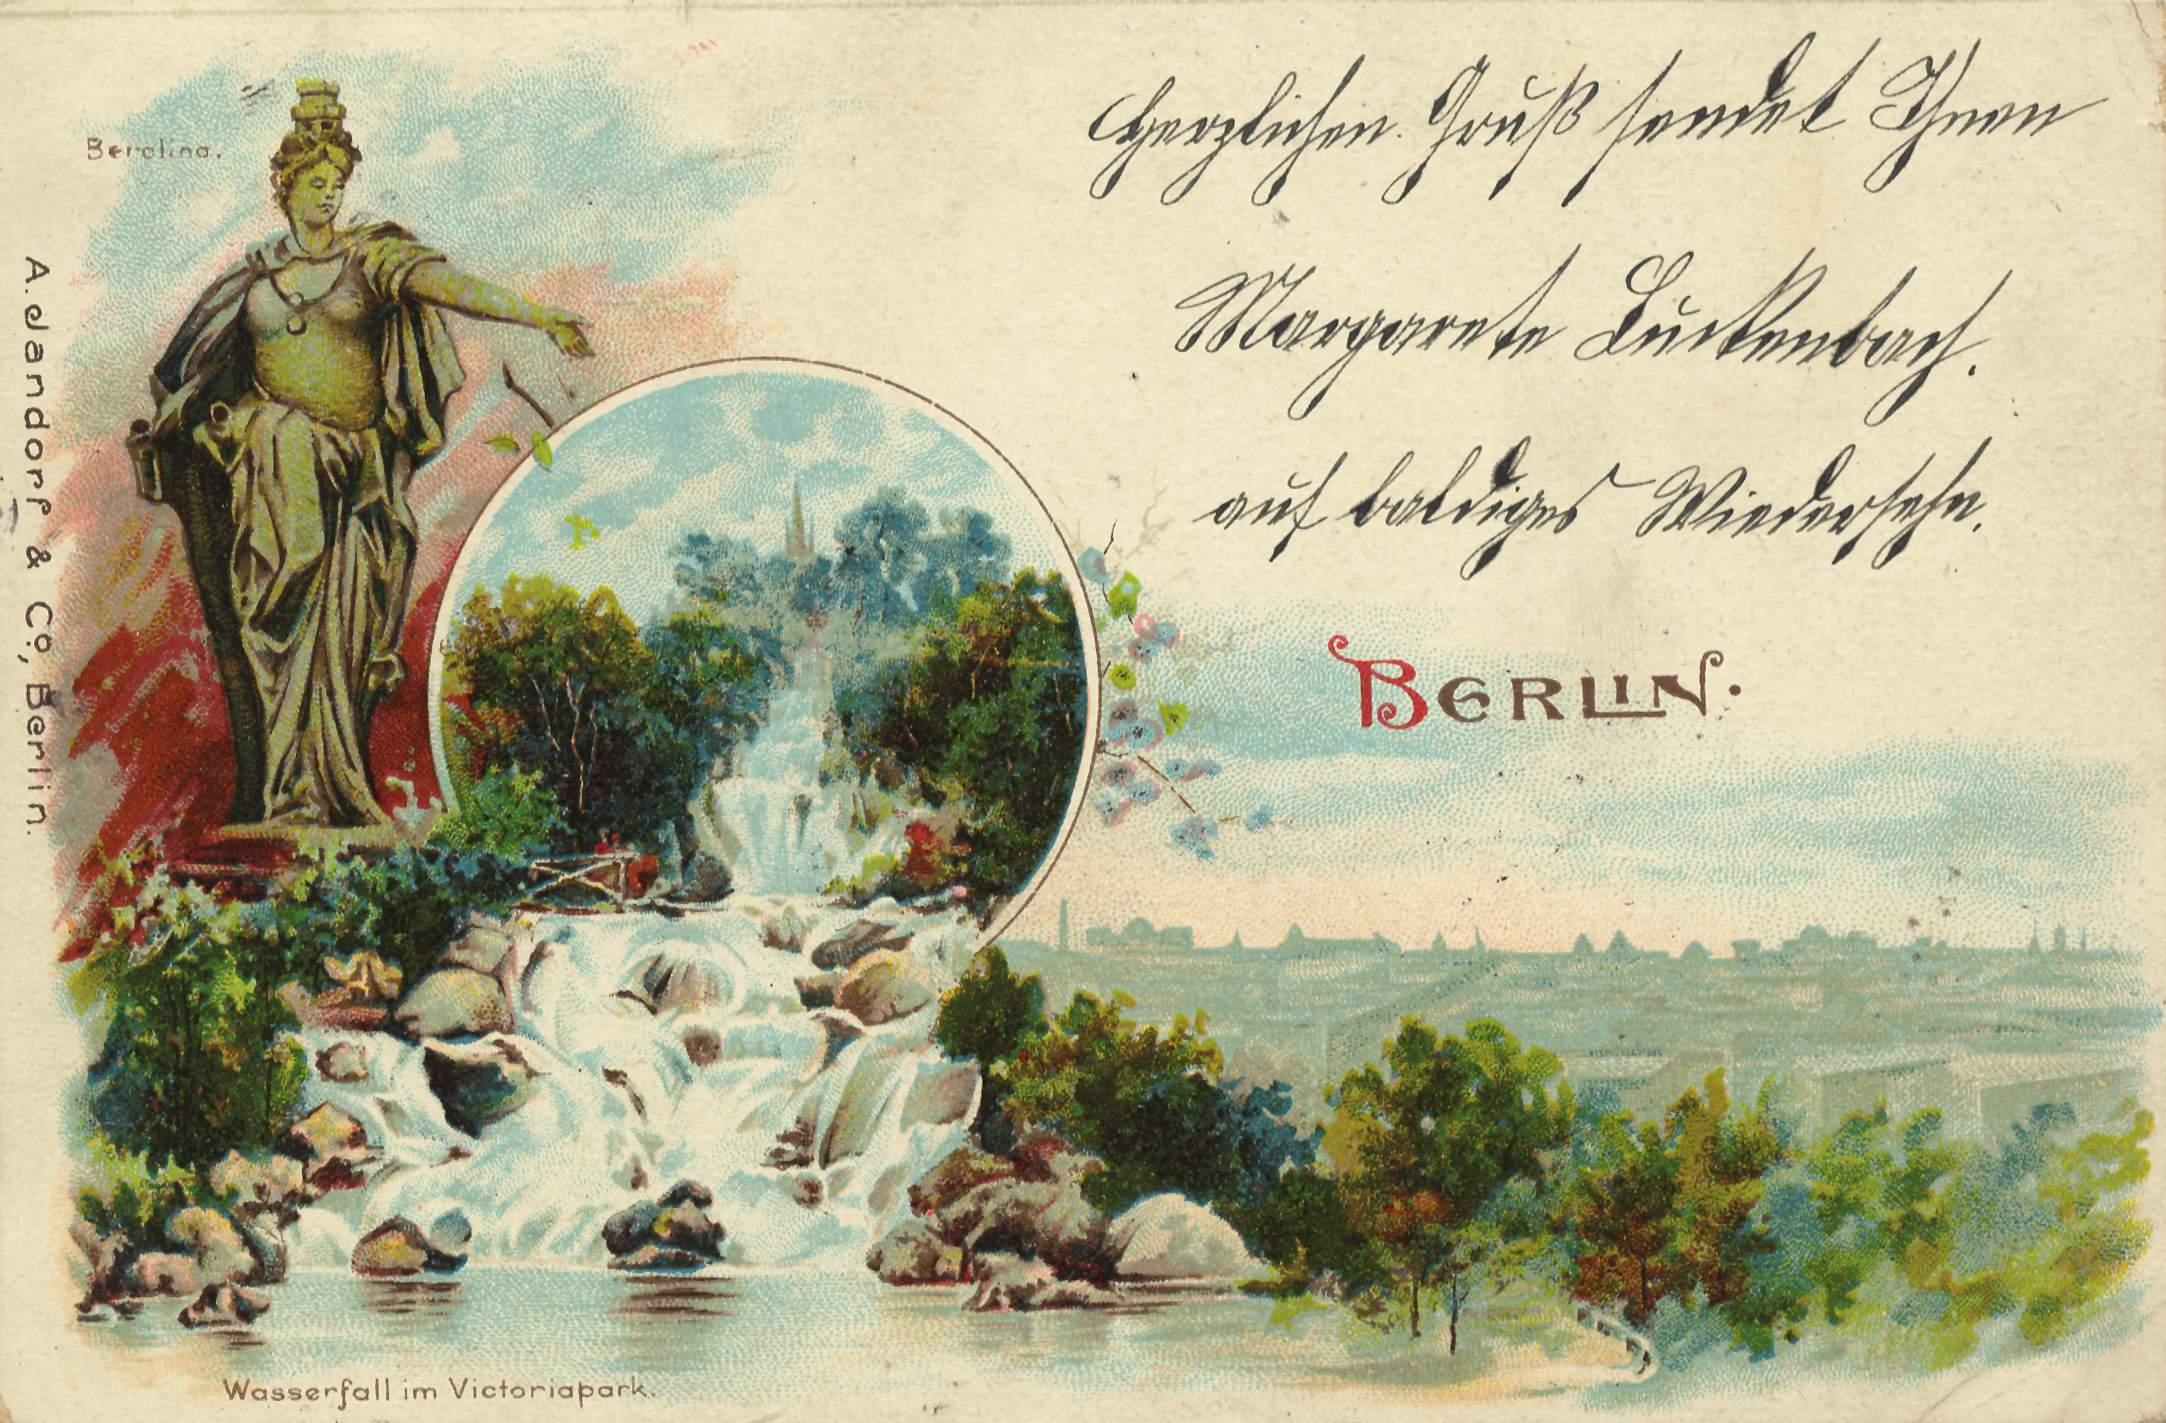 berlin kreuzberg berlin berolina wasserfall im viktoriapark. Black Bedroom Furniture Sets. Home Design Ideas